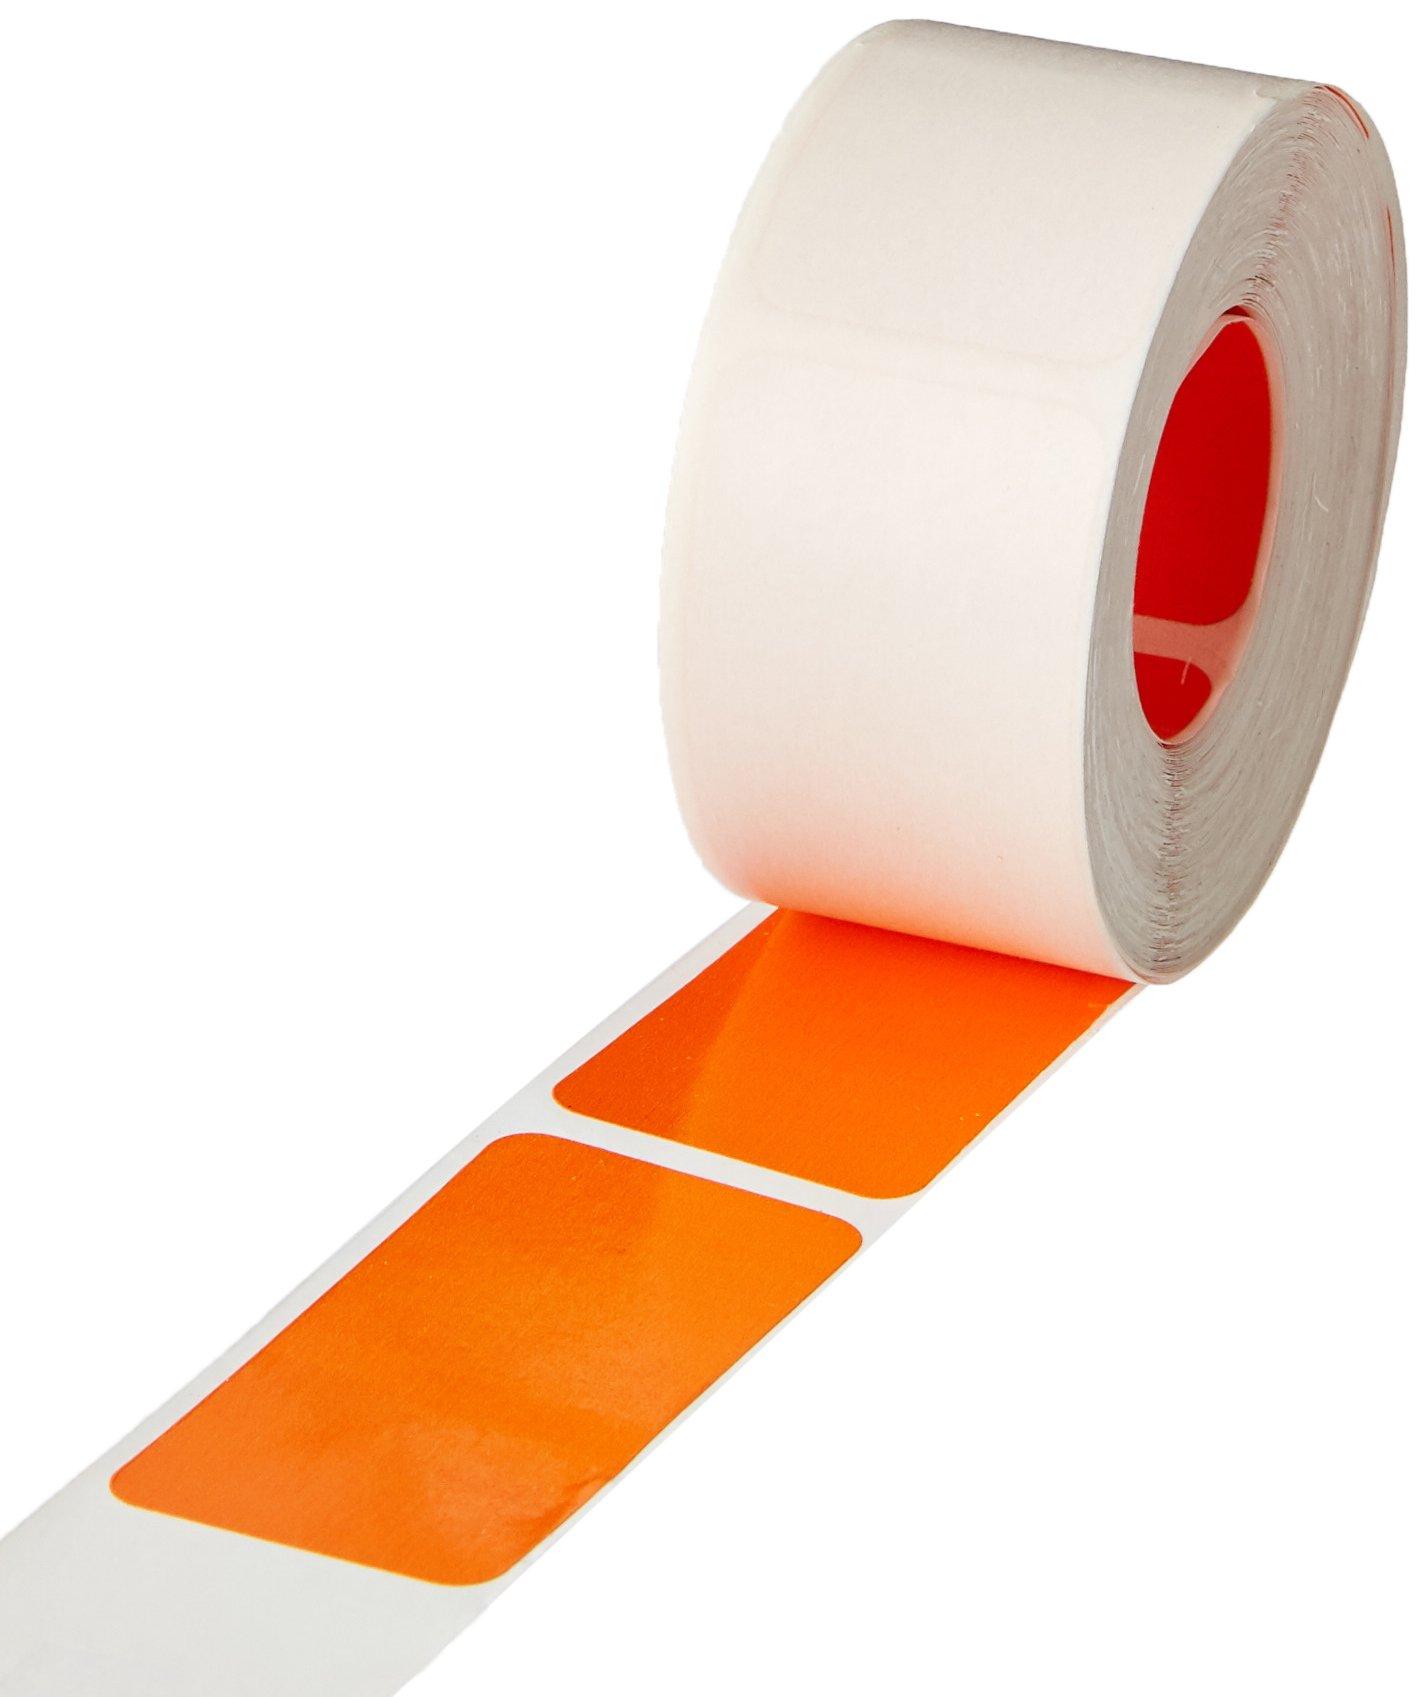 SMEAD COMPATIBLE CCOR Cc Color Code Label, Permanent, Solid, 1'' x 2'', Orange Paper (Pack of 250)